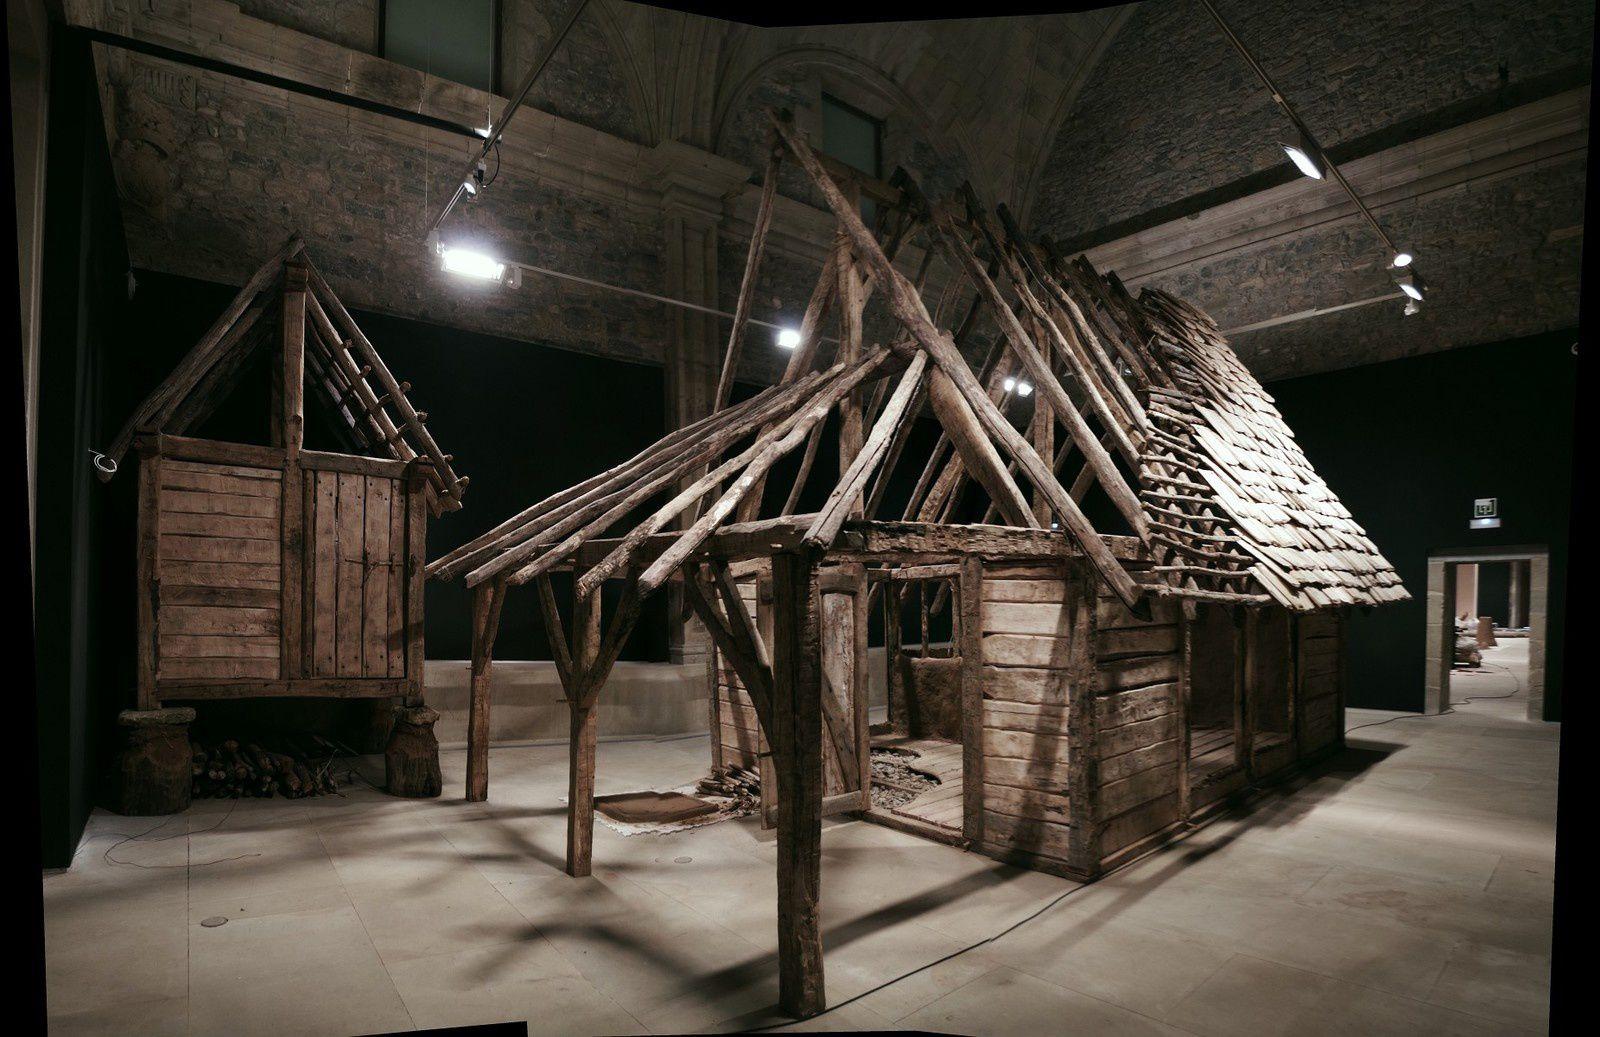 La cabaña gauloisa en España